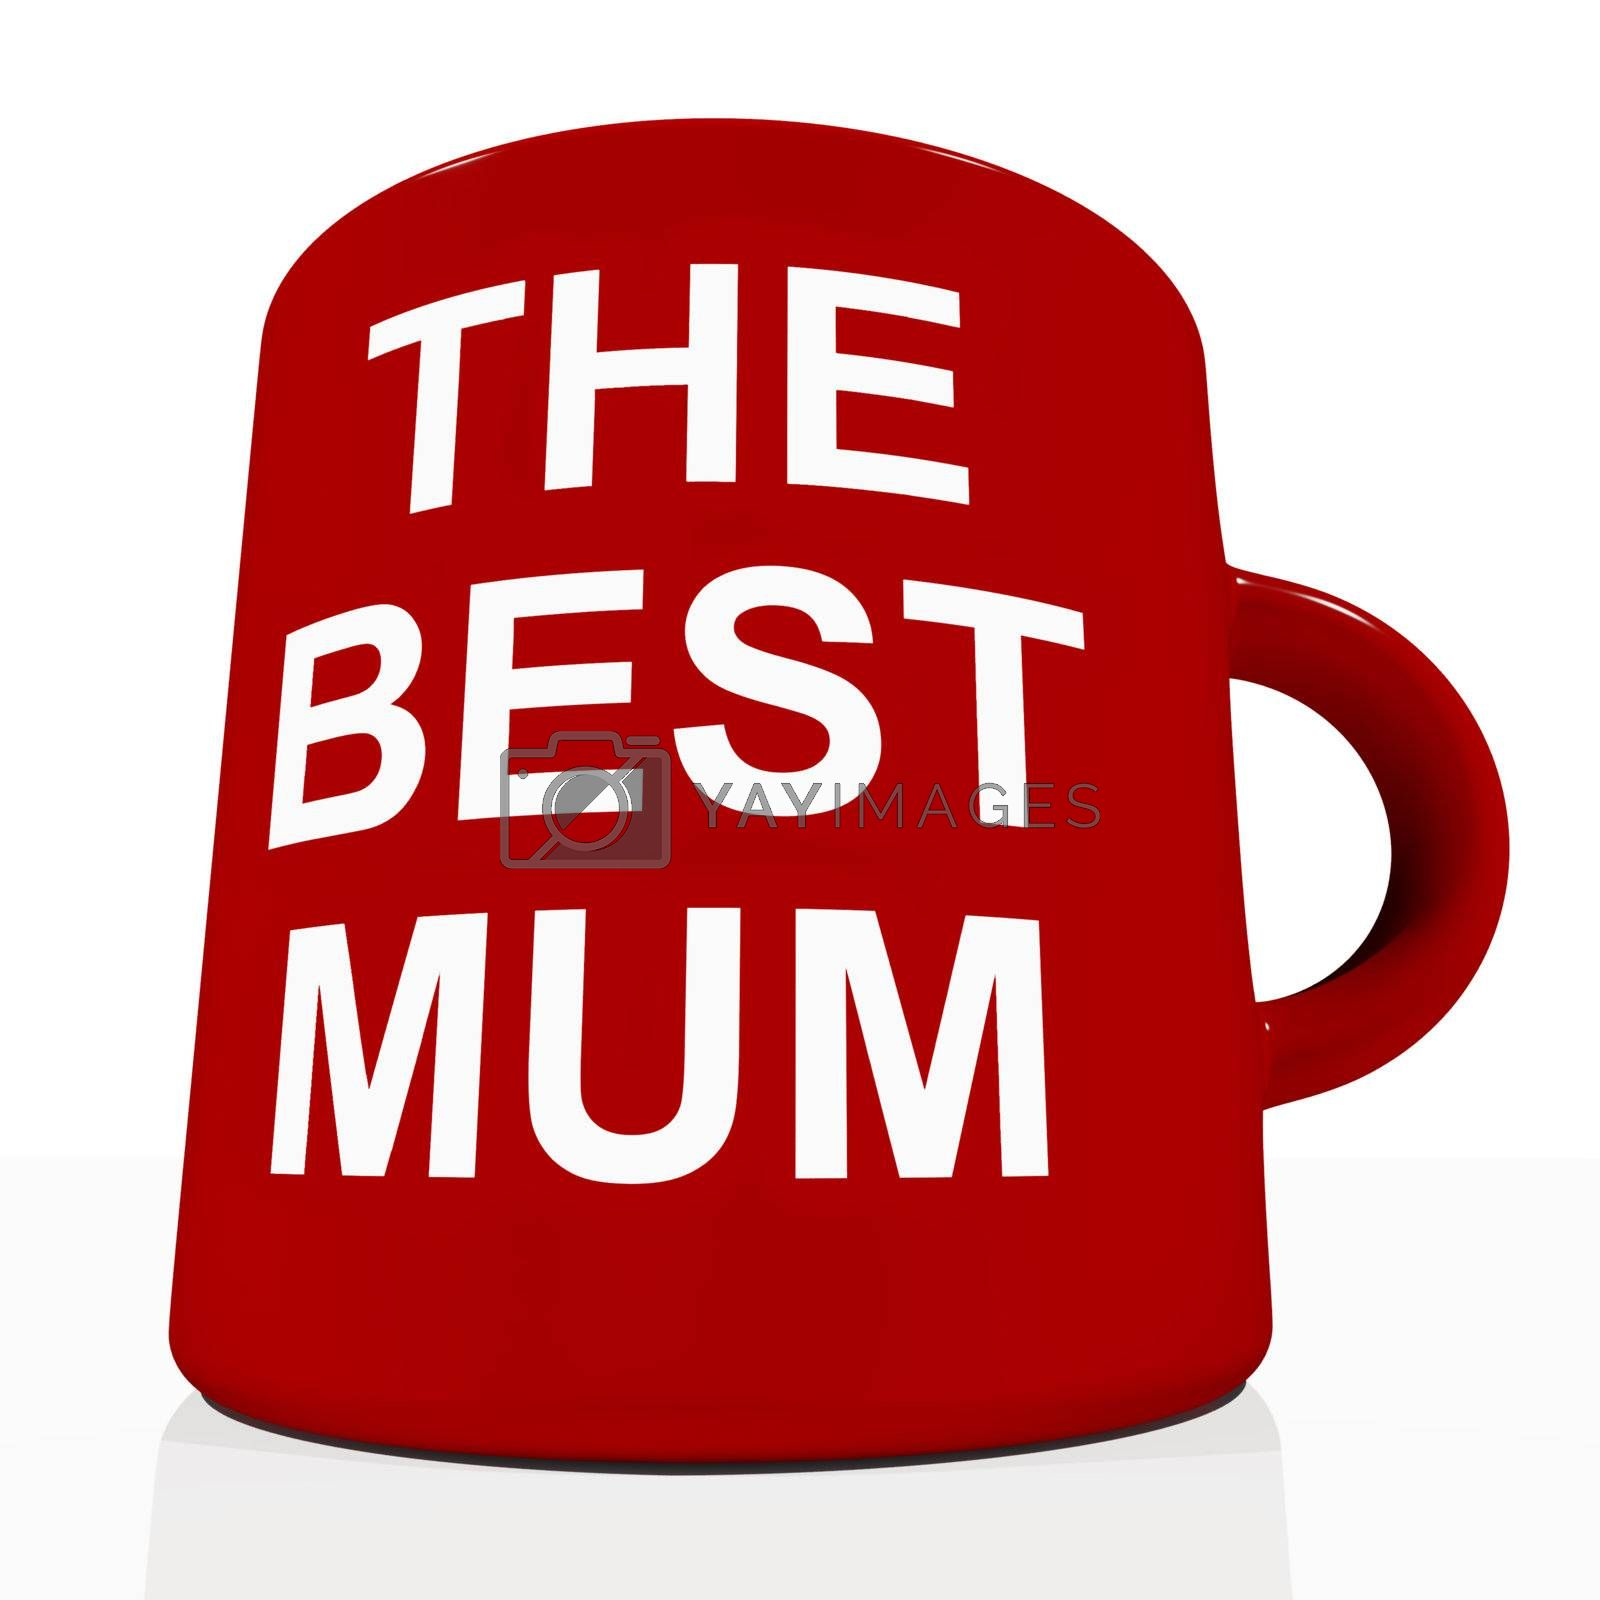 Red Best Mum Mug Showing Loving Mother